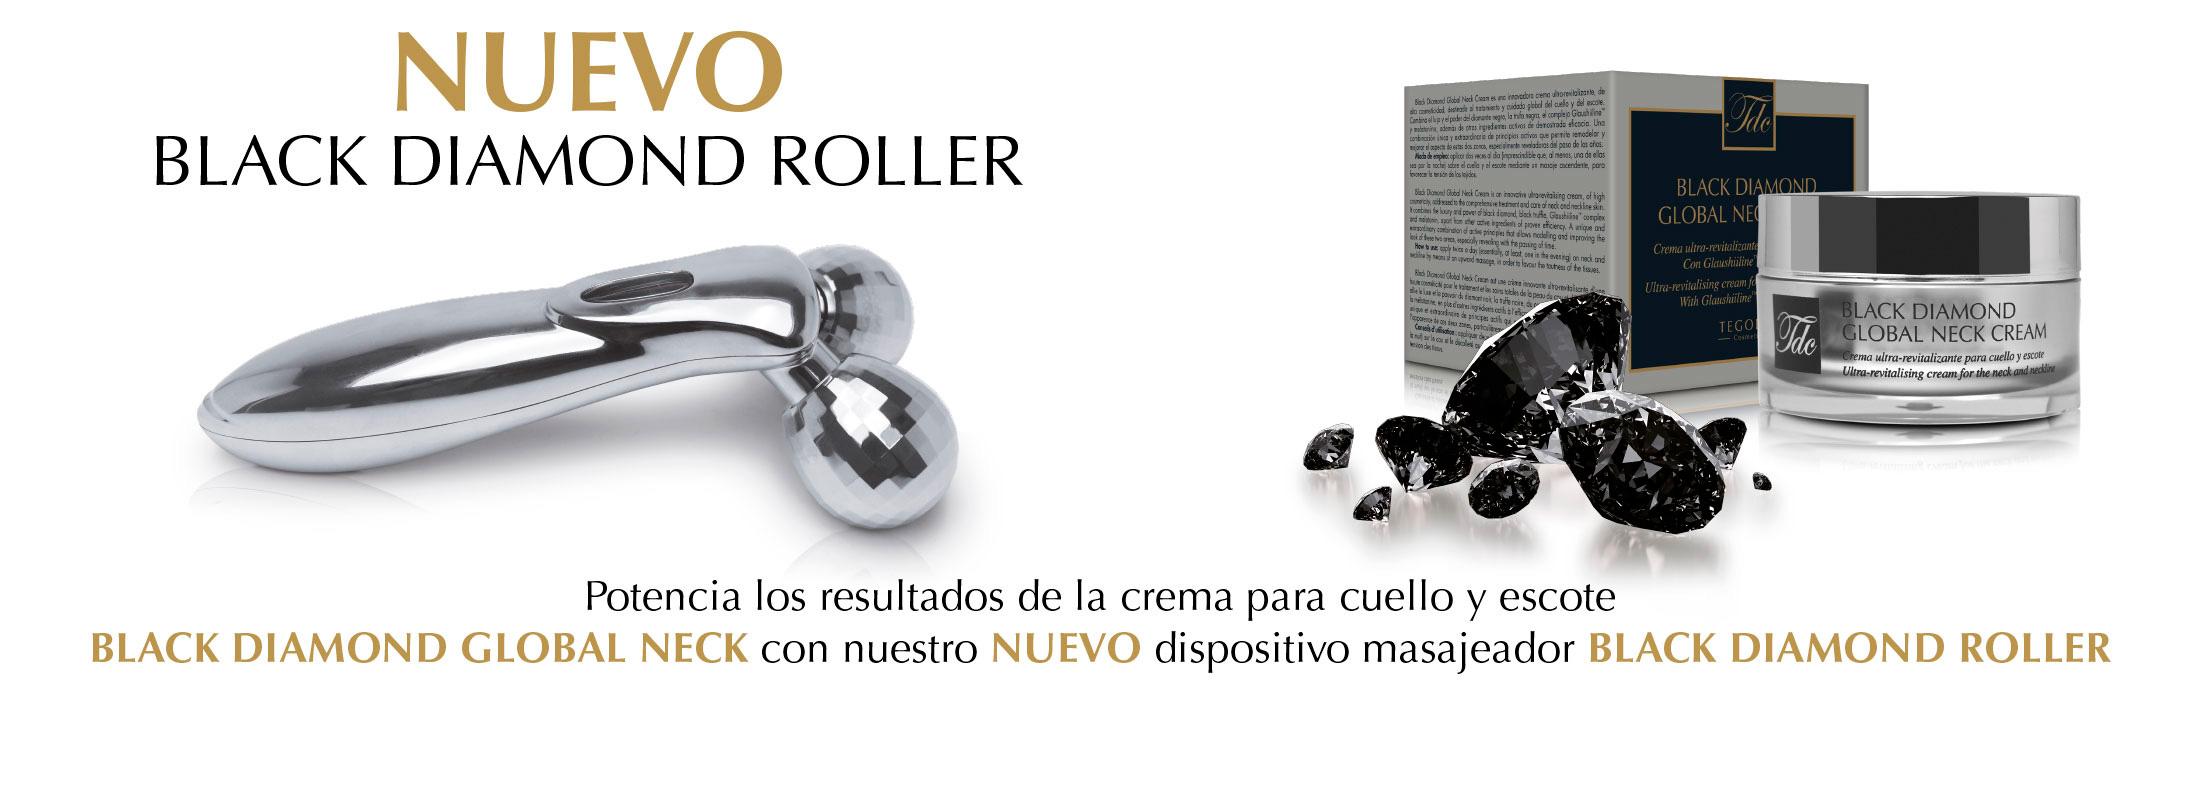 Black Diamond Global Neck Cream con black diamond roller